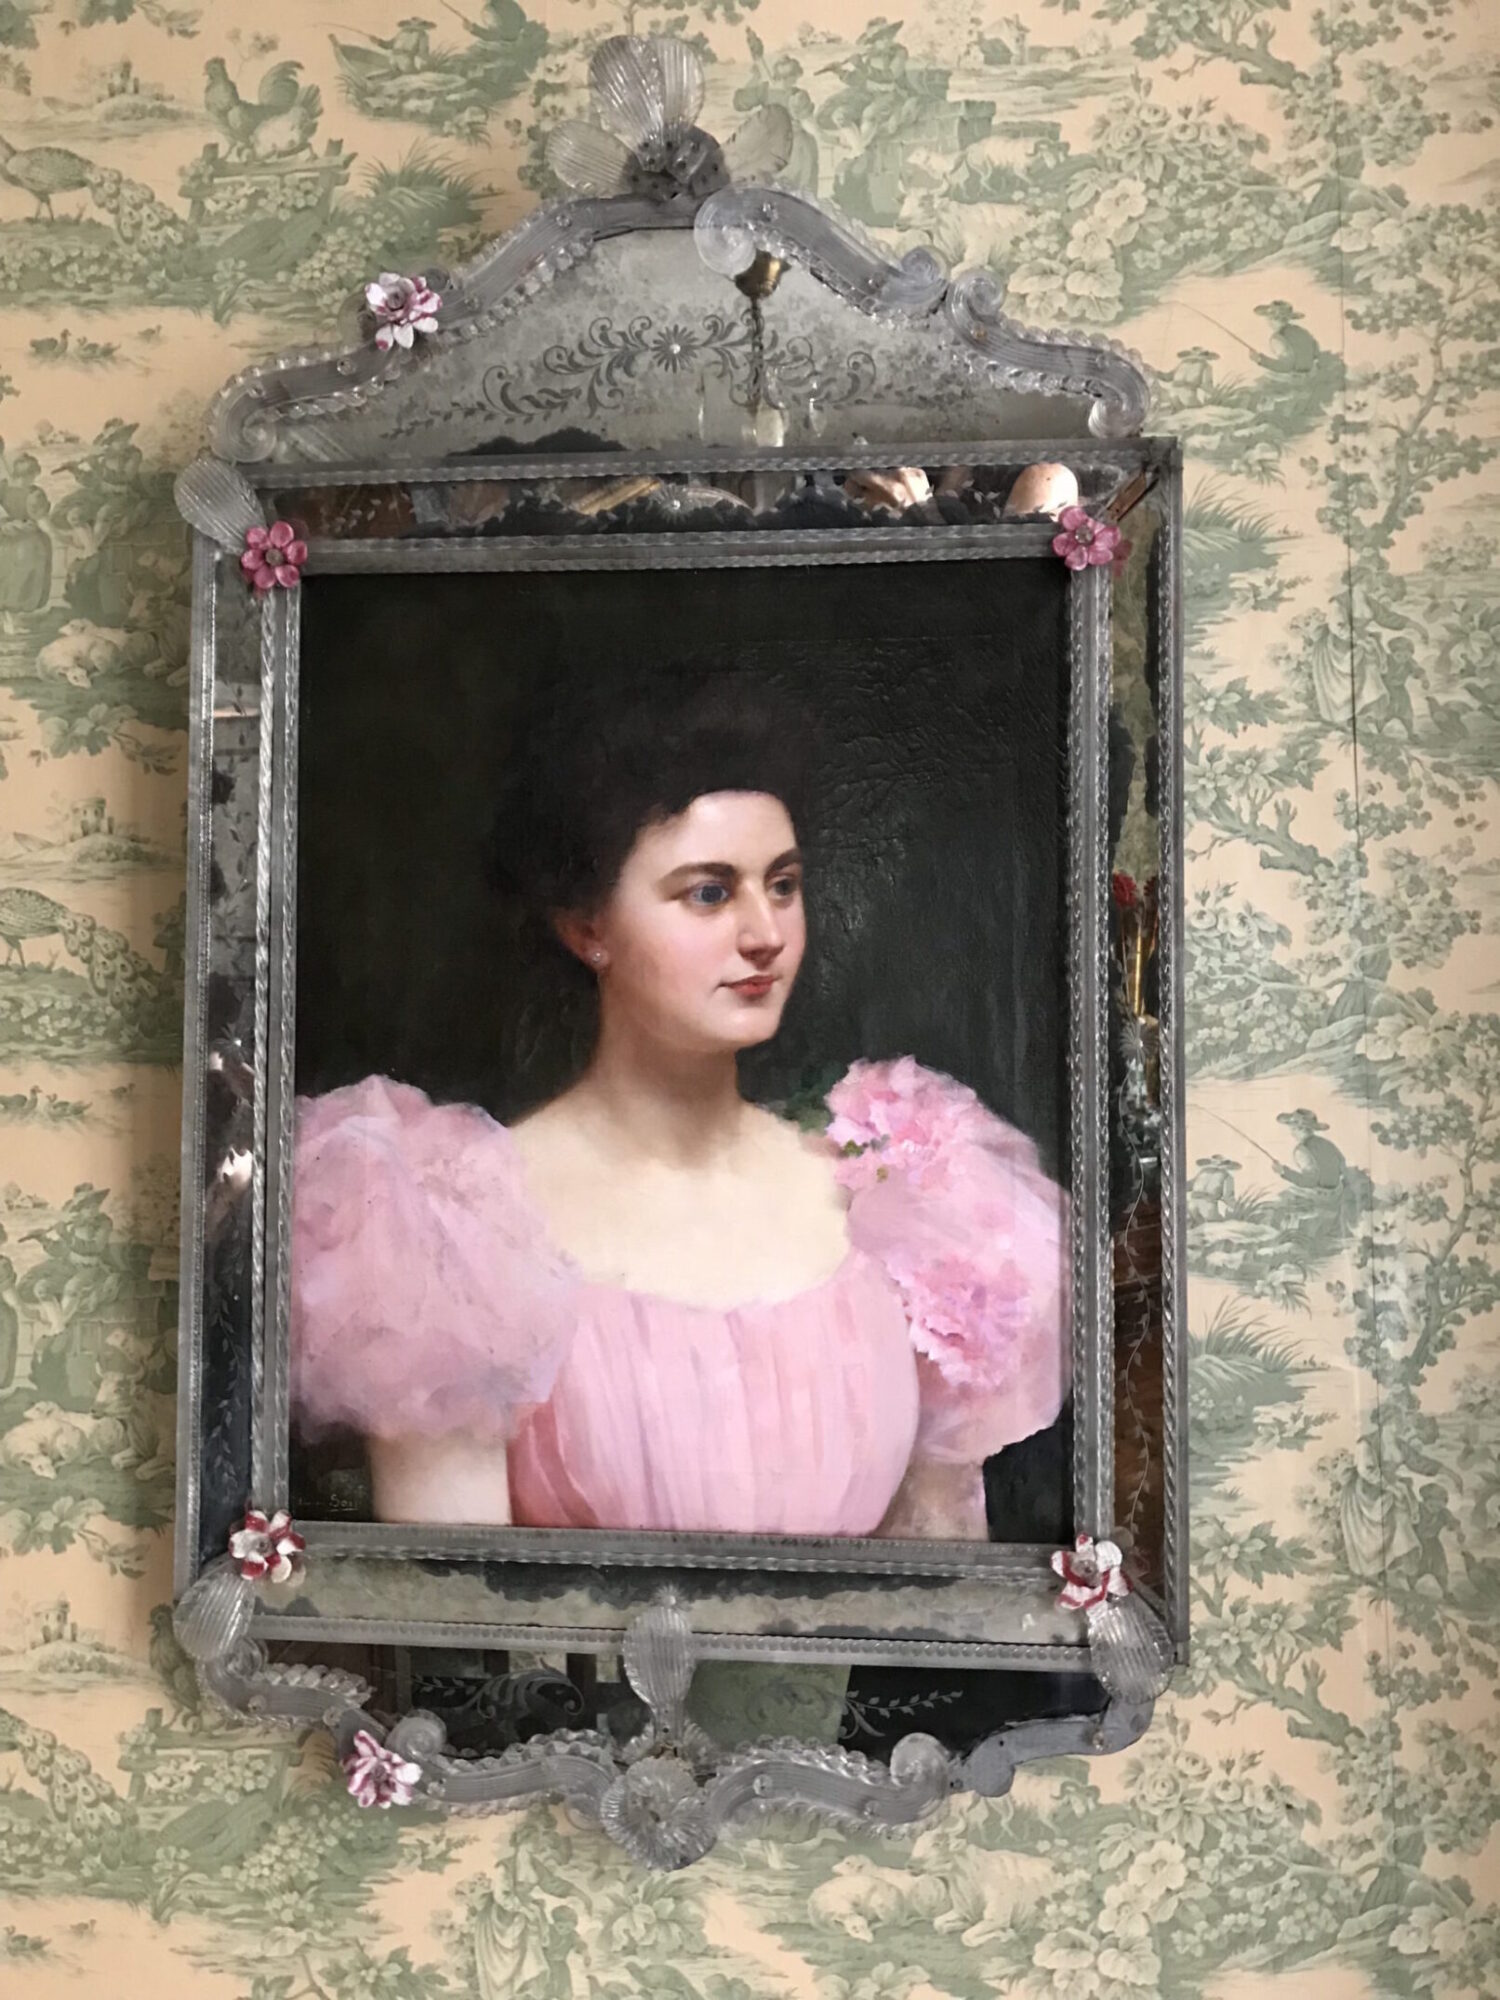 Misia's boudoir painting